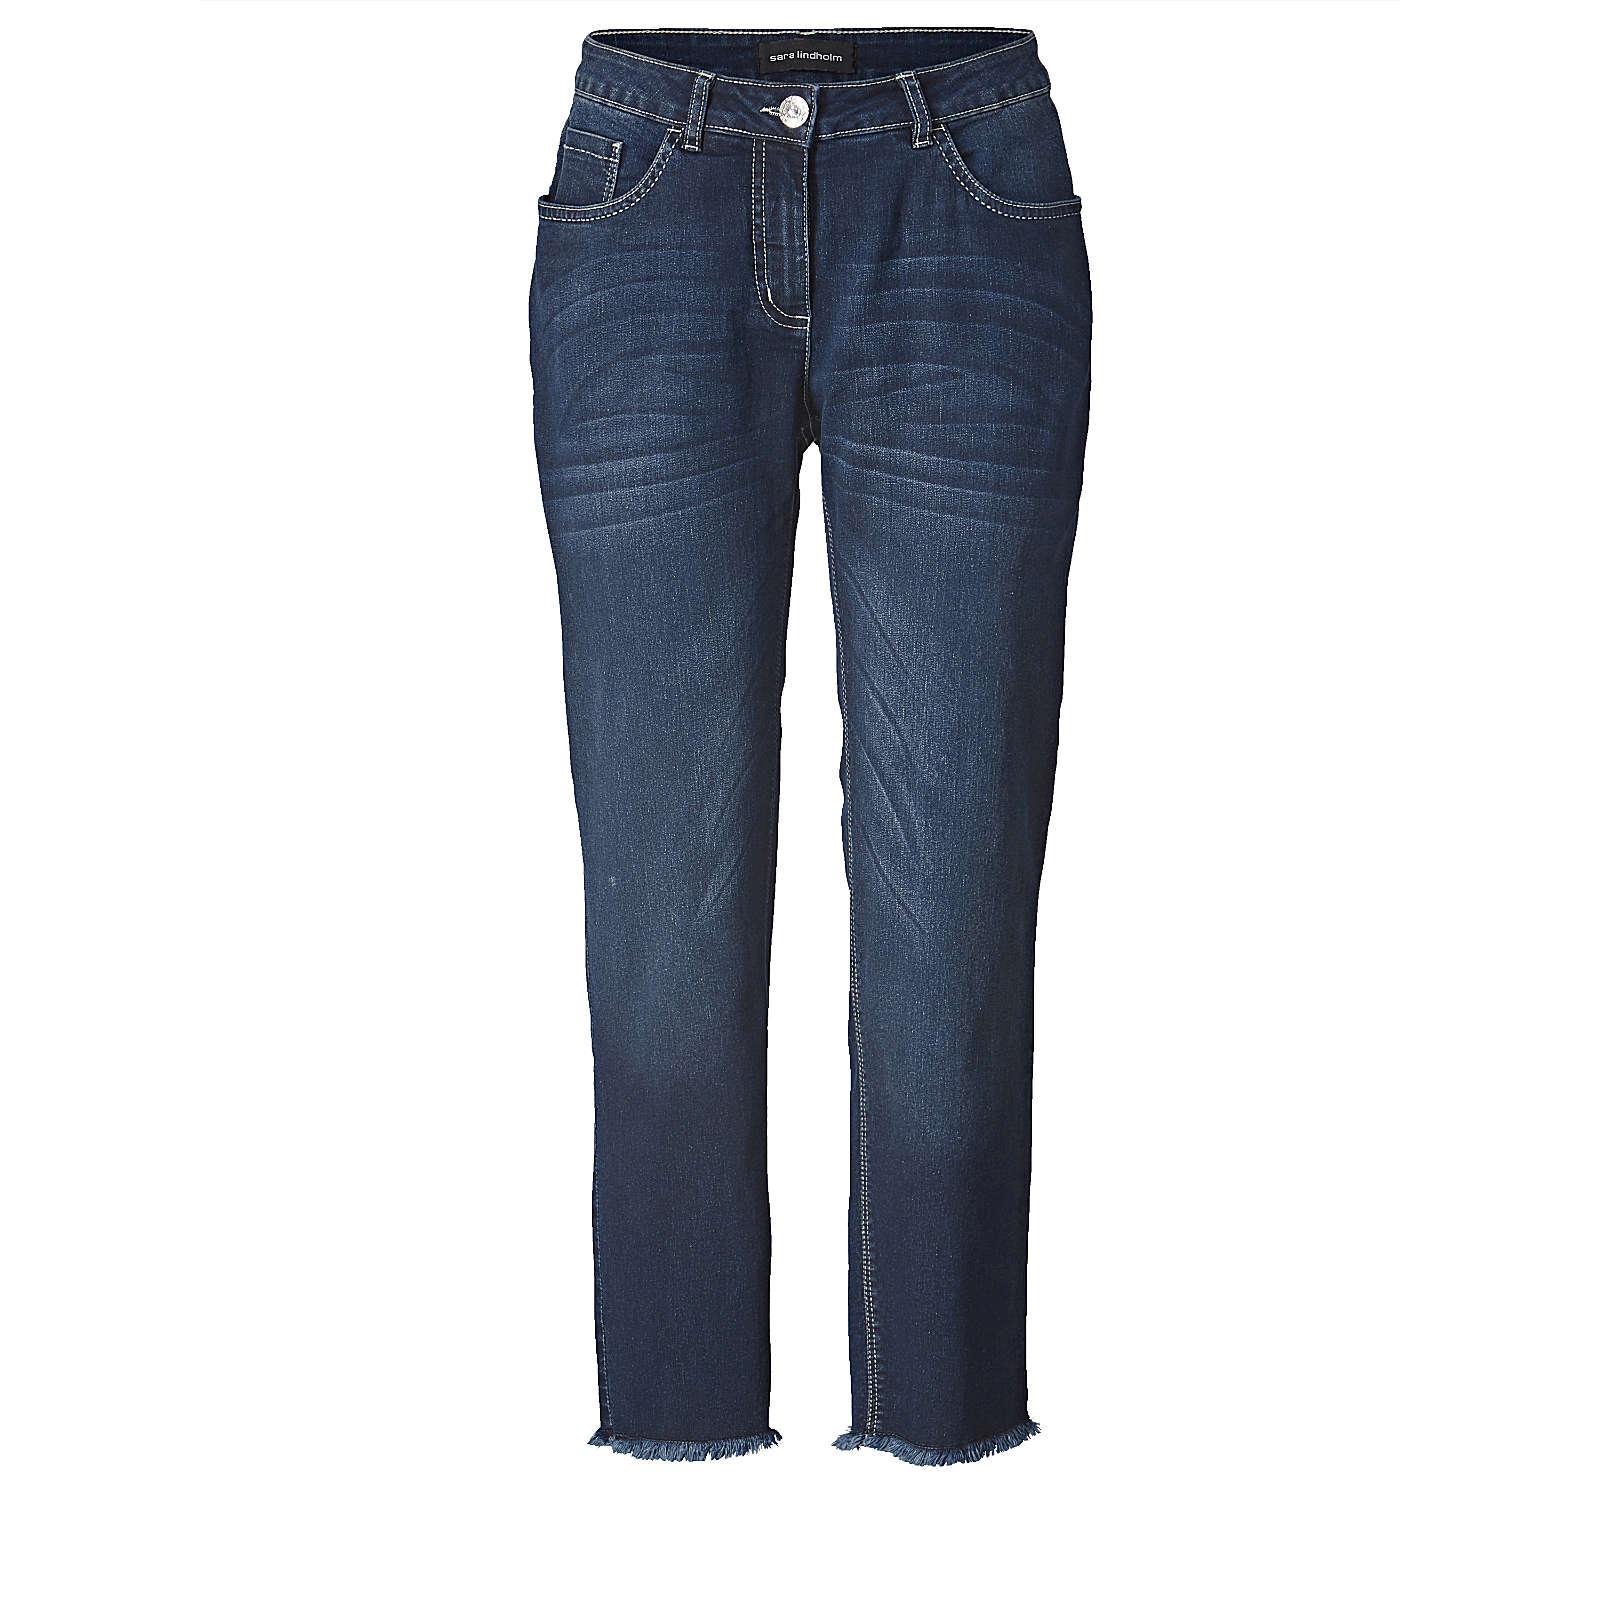 Sara Lindholm Straight Cut Jeans knöchellang mit Fransensaum dunkelblau Damen Gr. 50